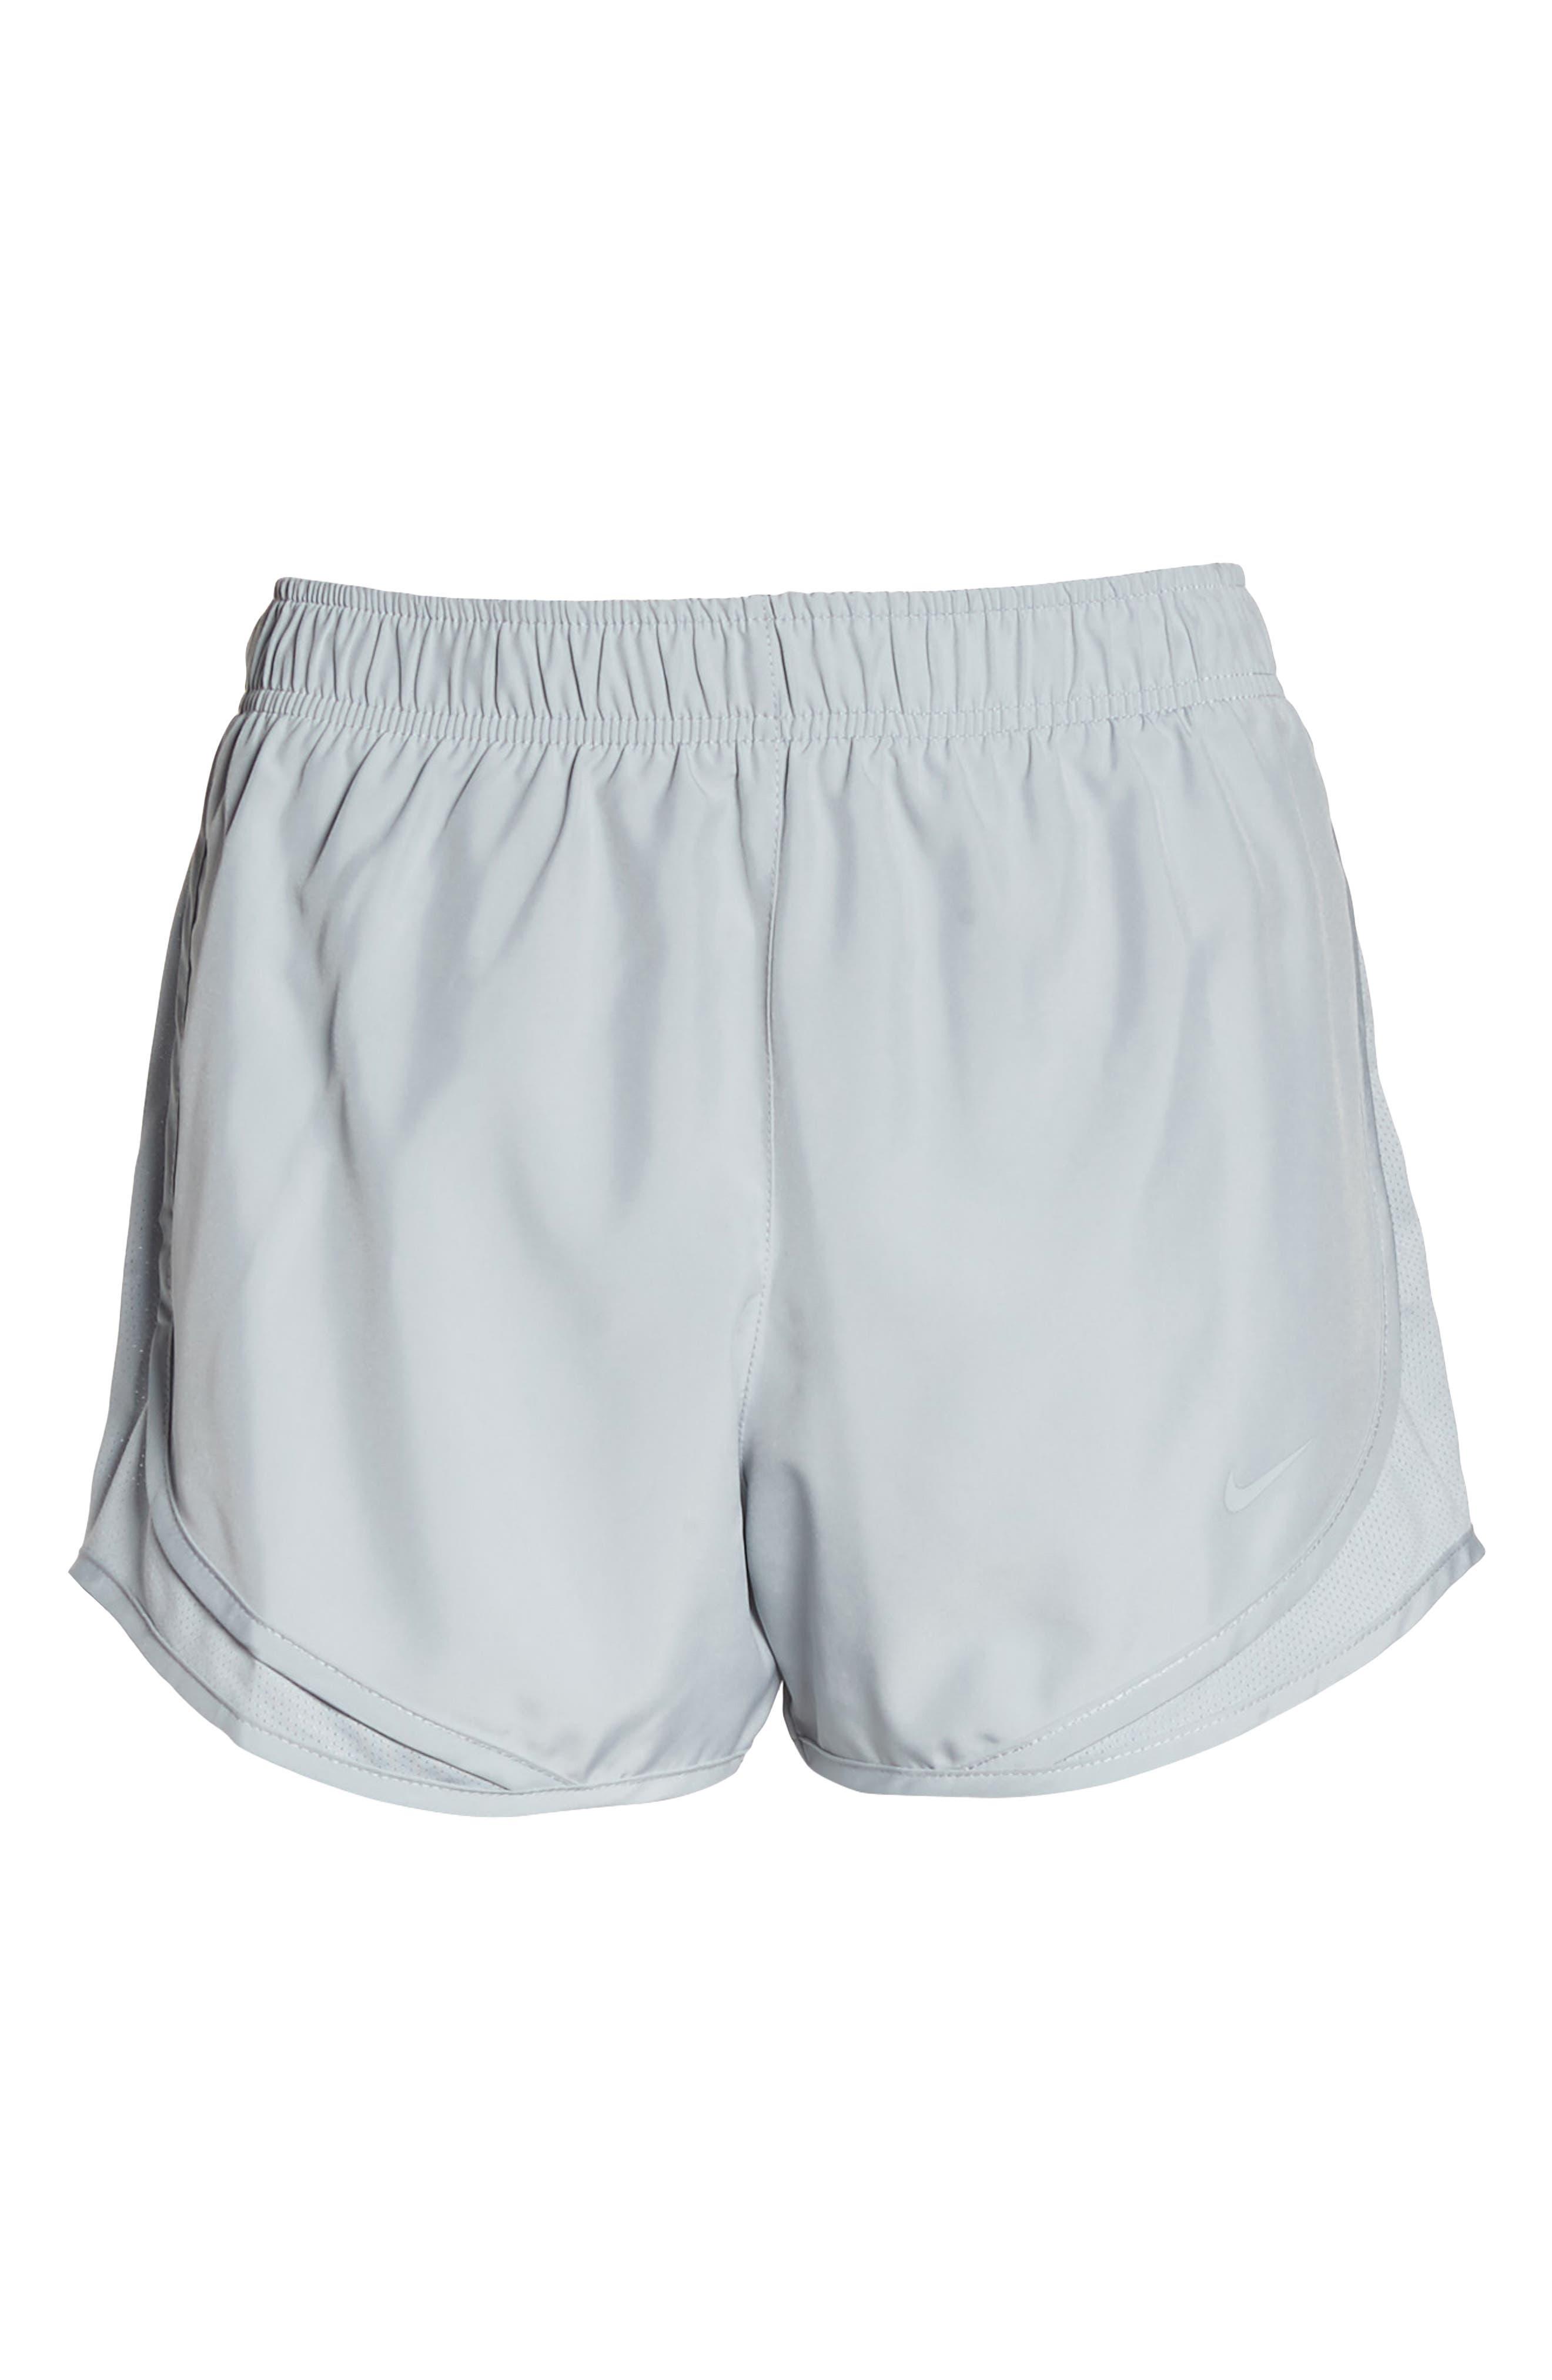 Dry Tempo Running Shorts,                             Alternate thumbnail 443, color,